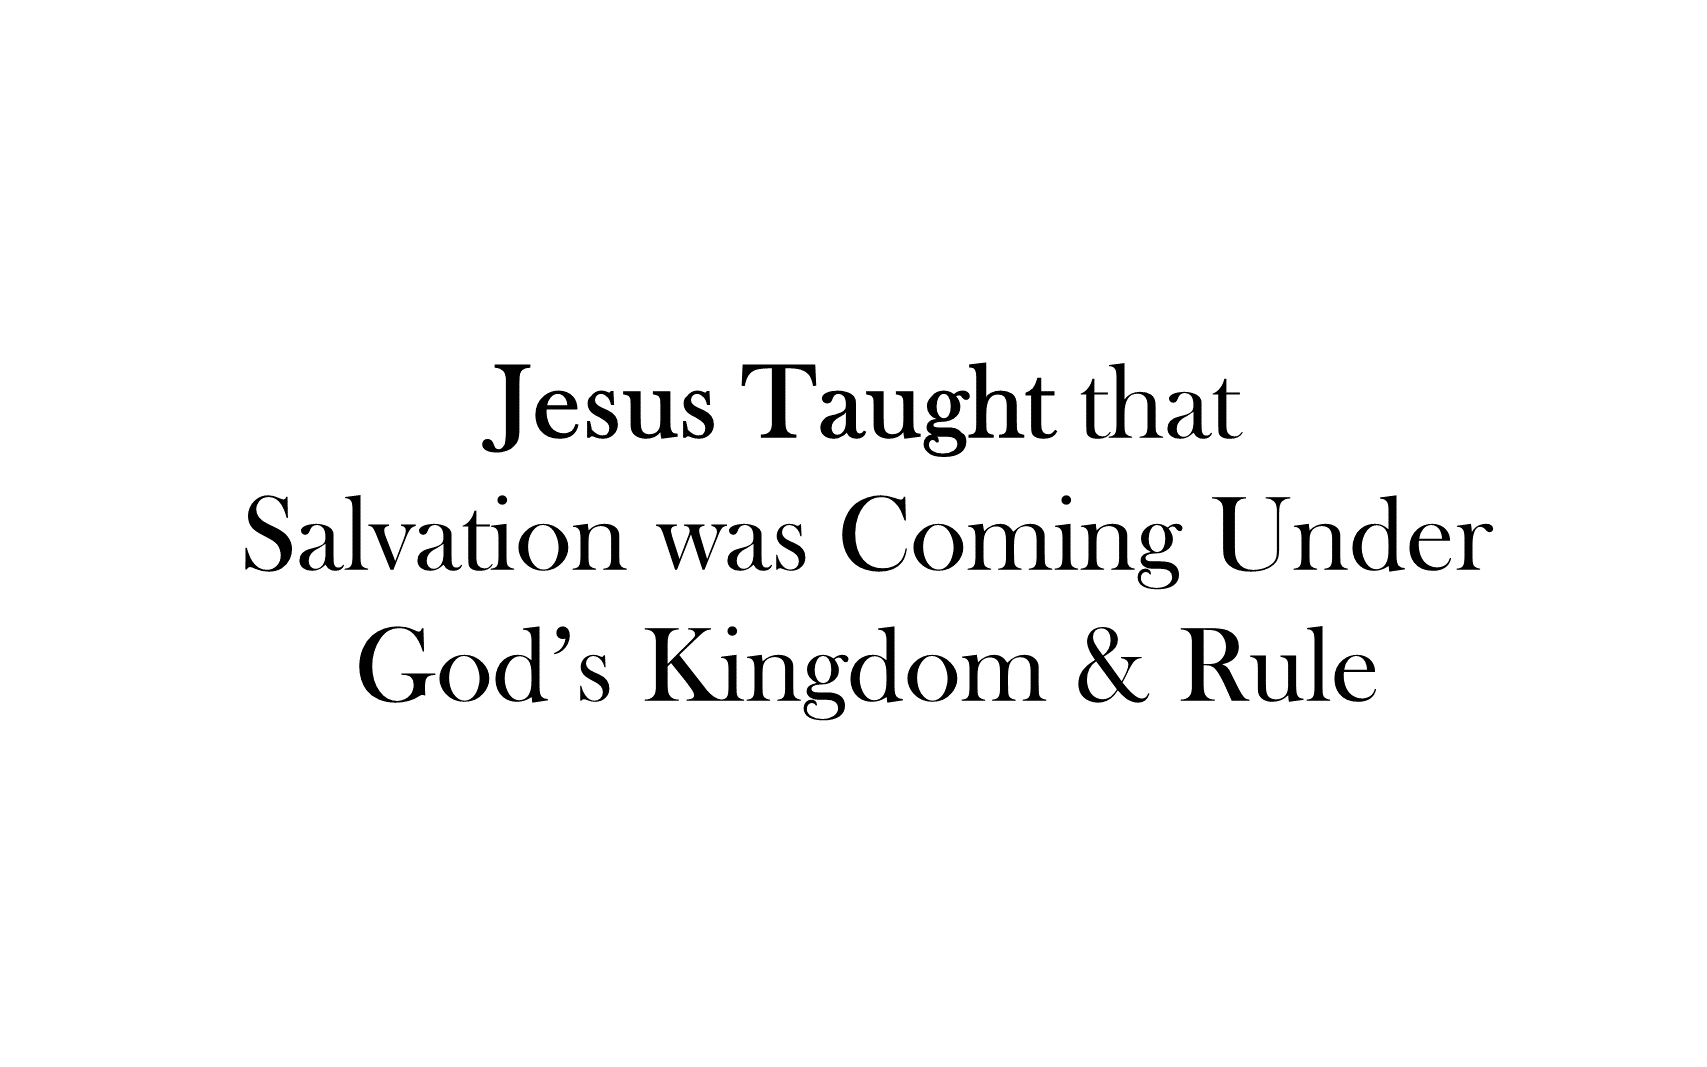 ESH-20 - The Discipline Of Disciple-Making - Seeing, Understanding, Entering, Living, & Seeking The Kingdom Of God ( (4)